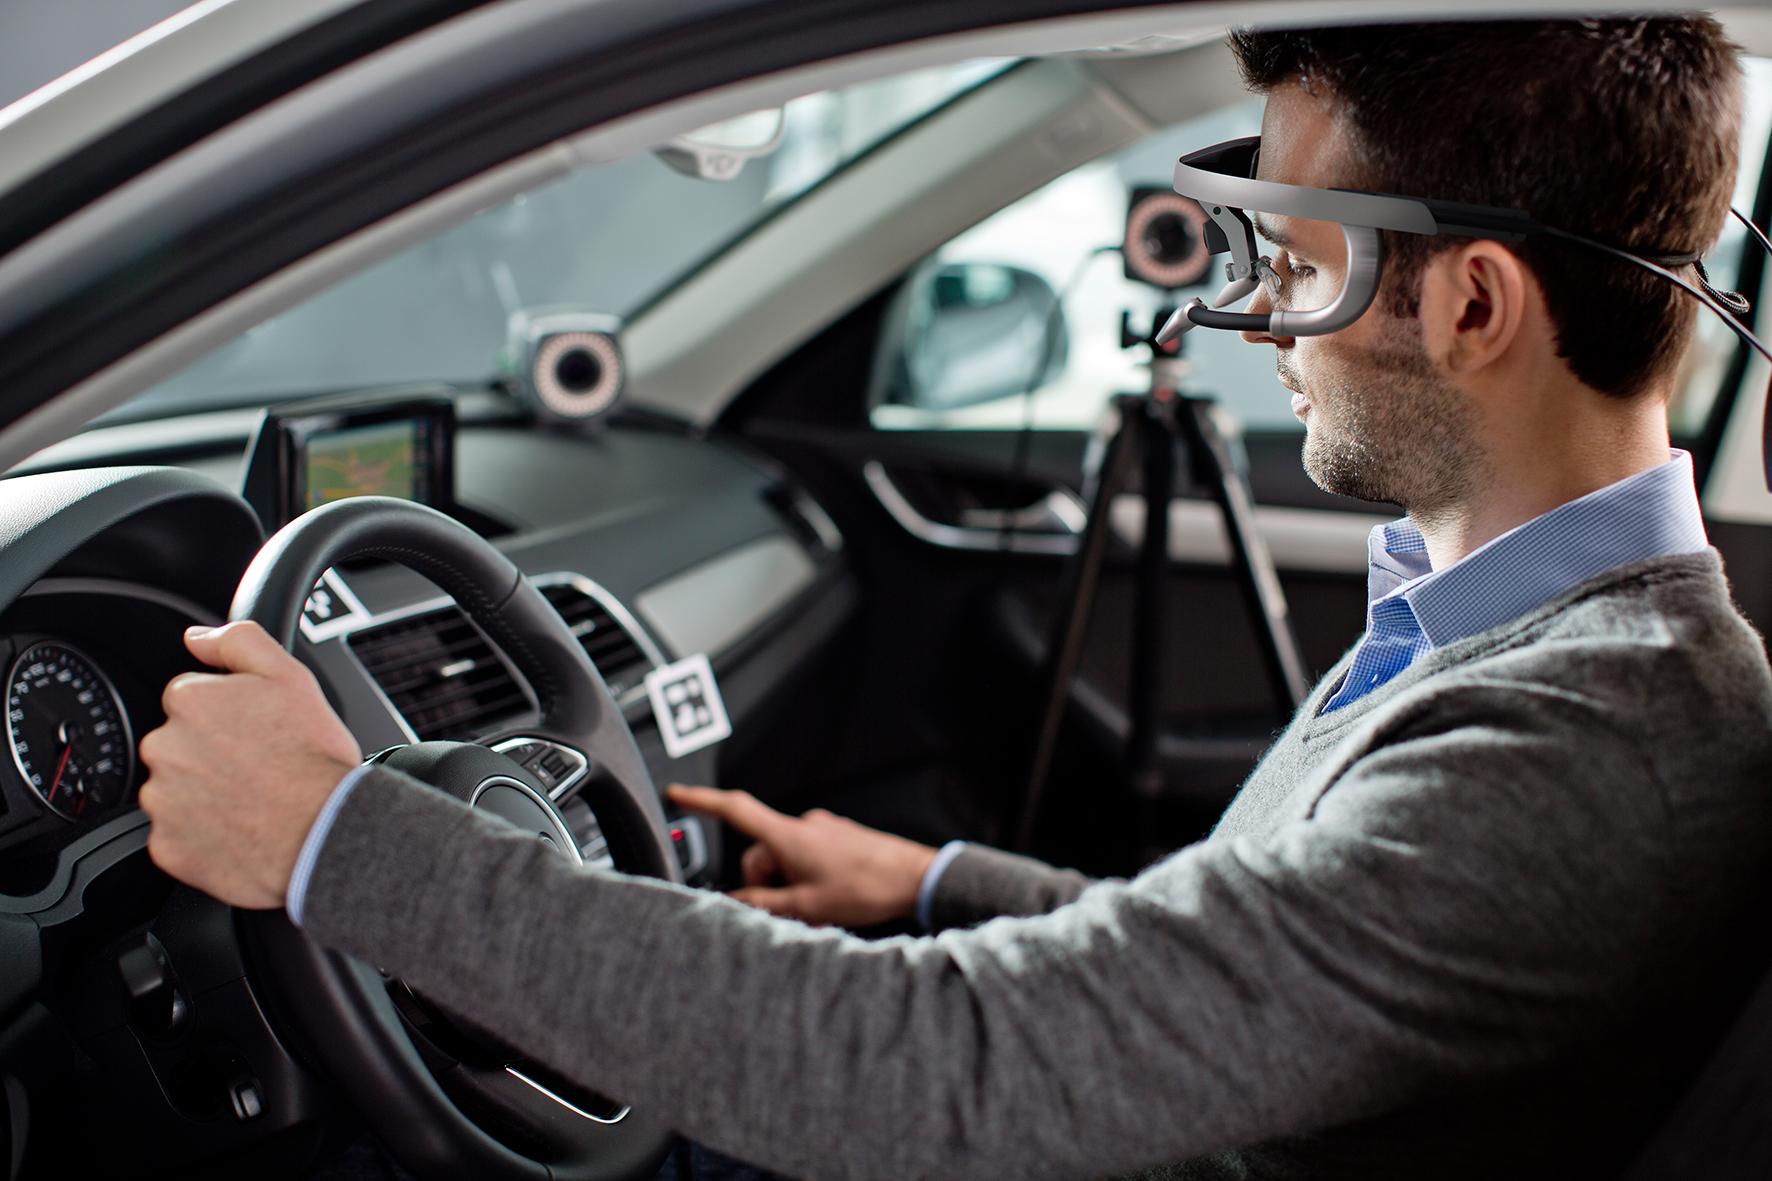 Man in a car wearing eye-tracking glasses